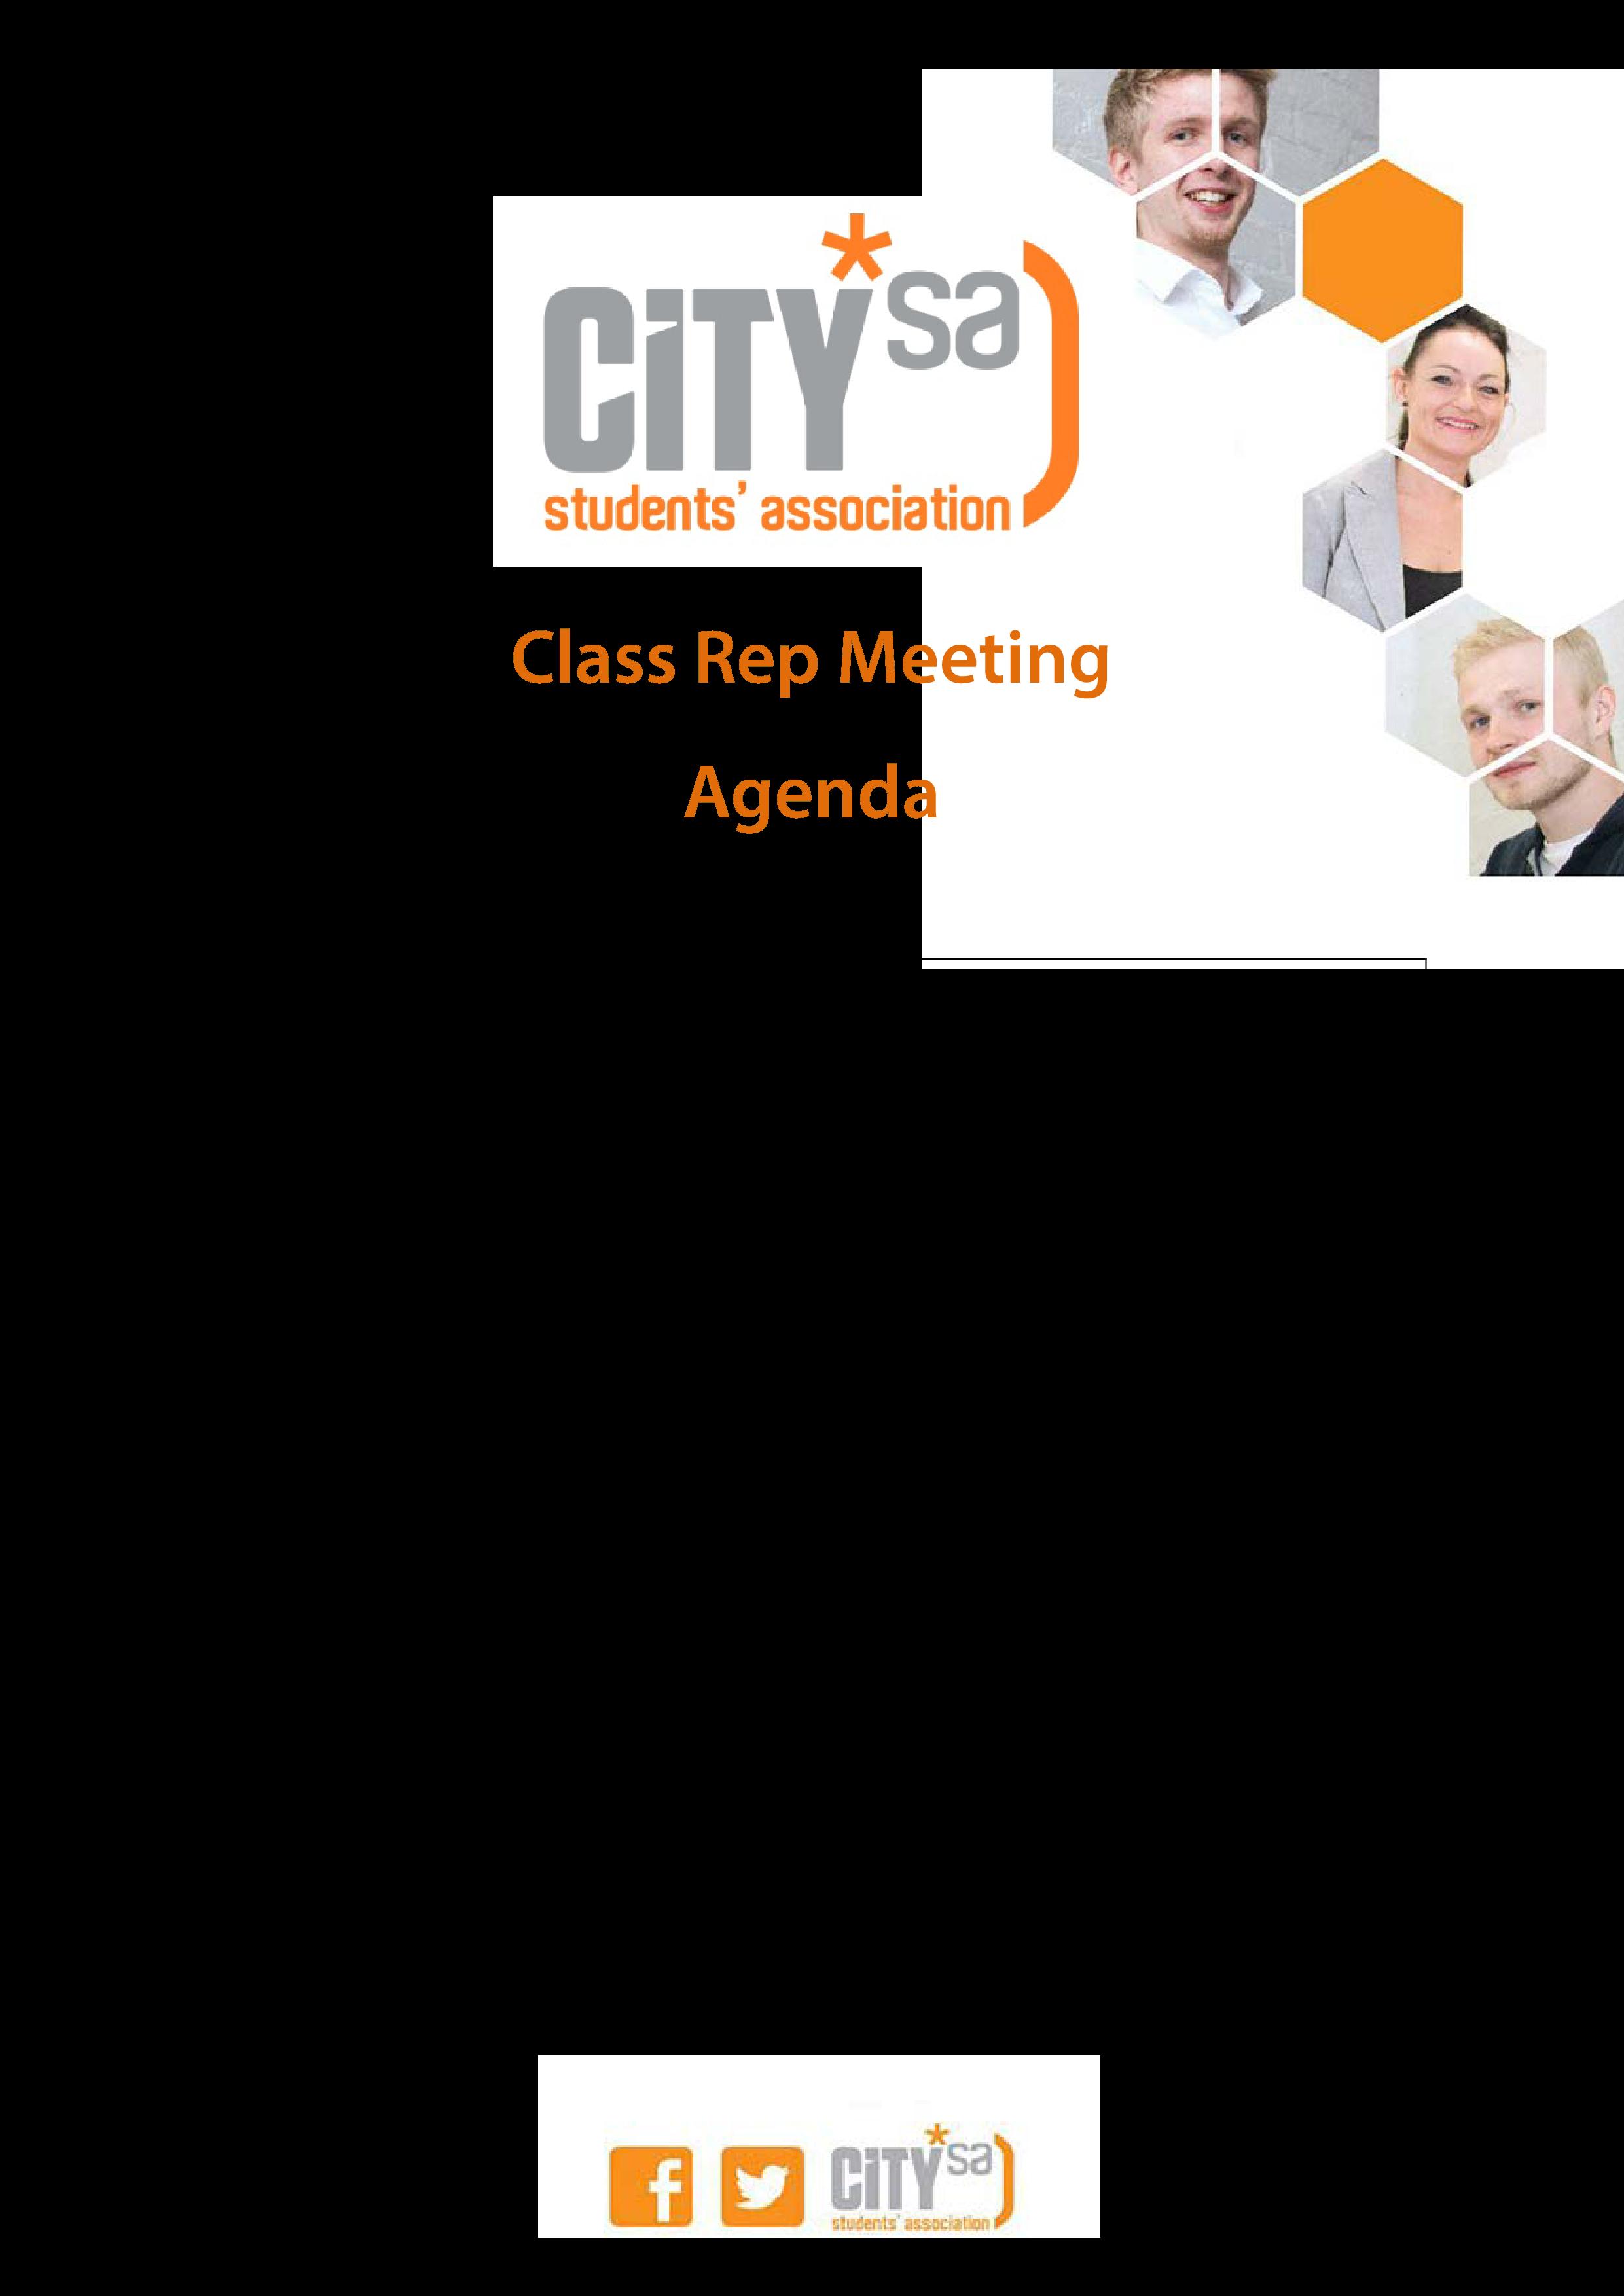 Free Classroom Meeting Agenda Templates At Allbusinesstemplates Com